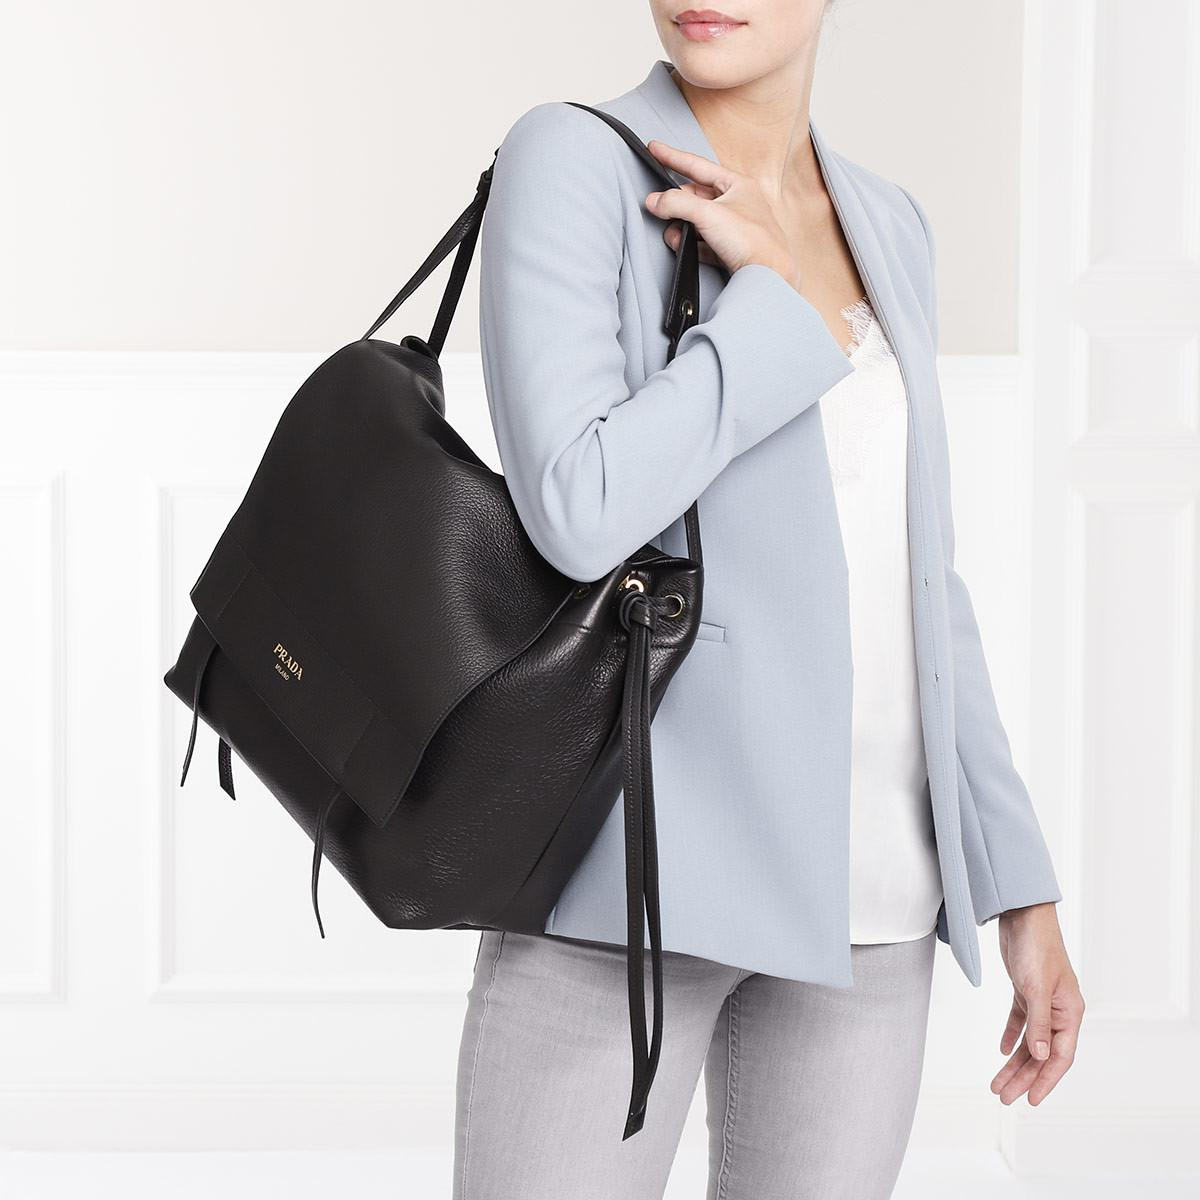 641d9889ee65 Prada - Black Shoulder Bag Grained Leather Nero - Lyst. View fullscreen